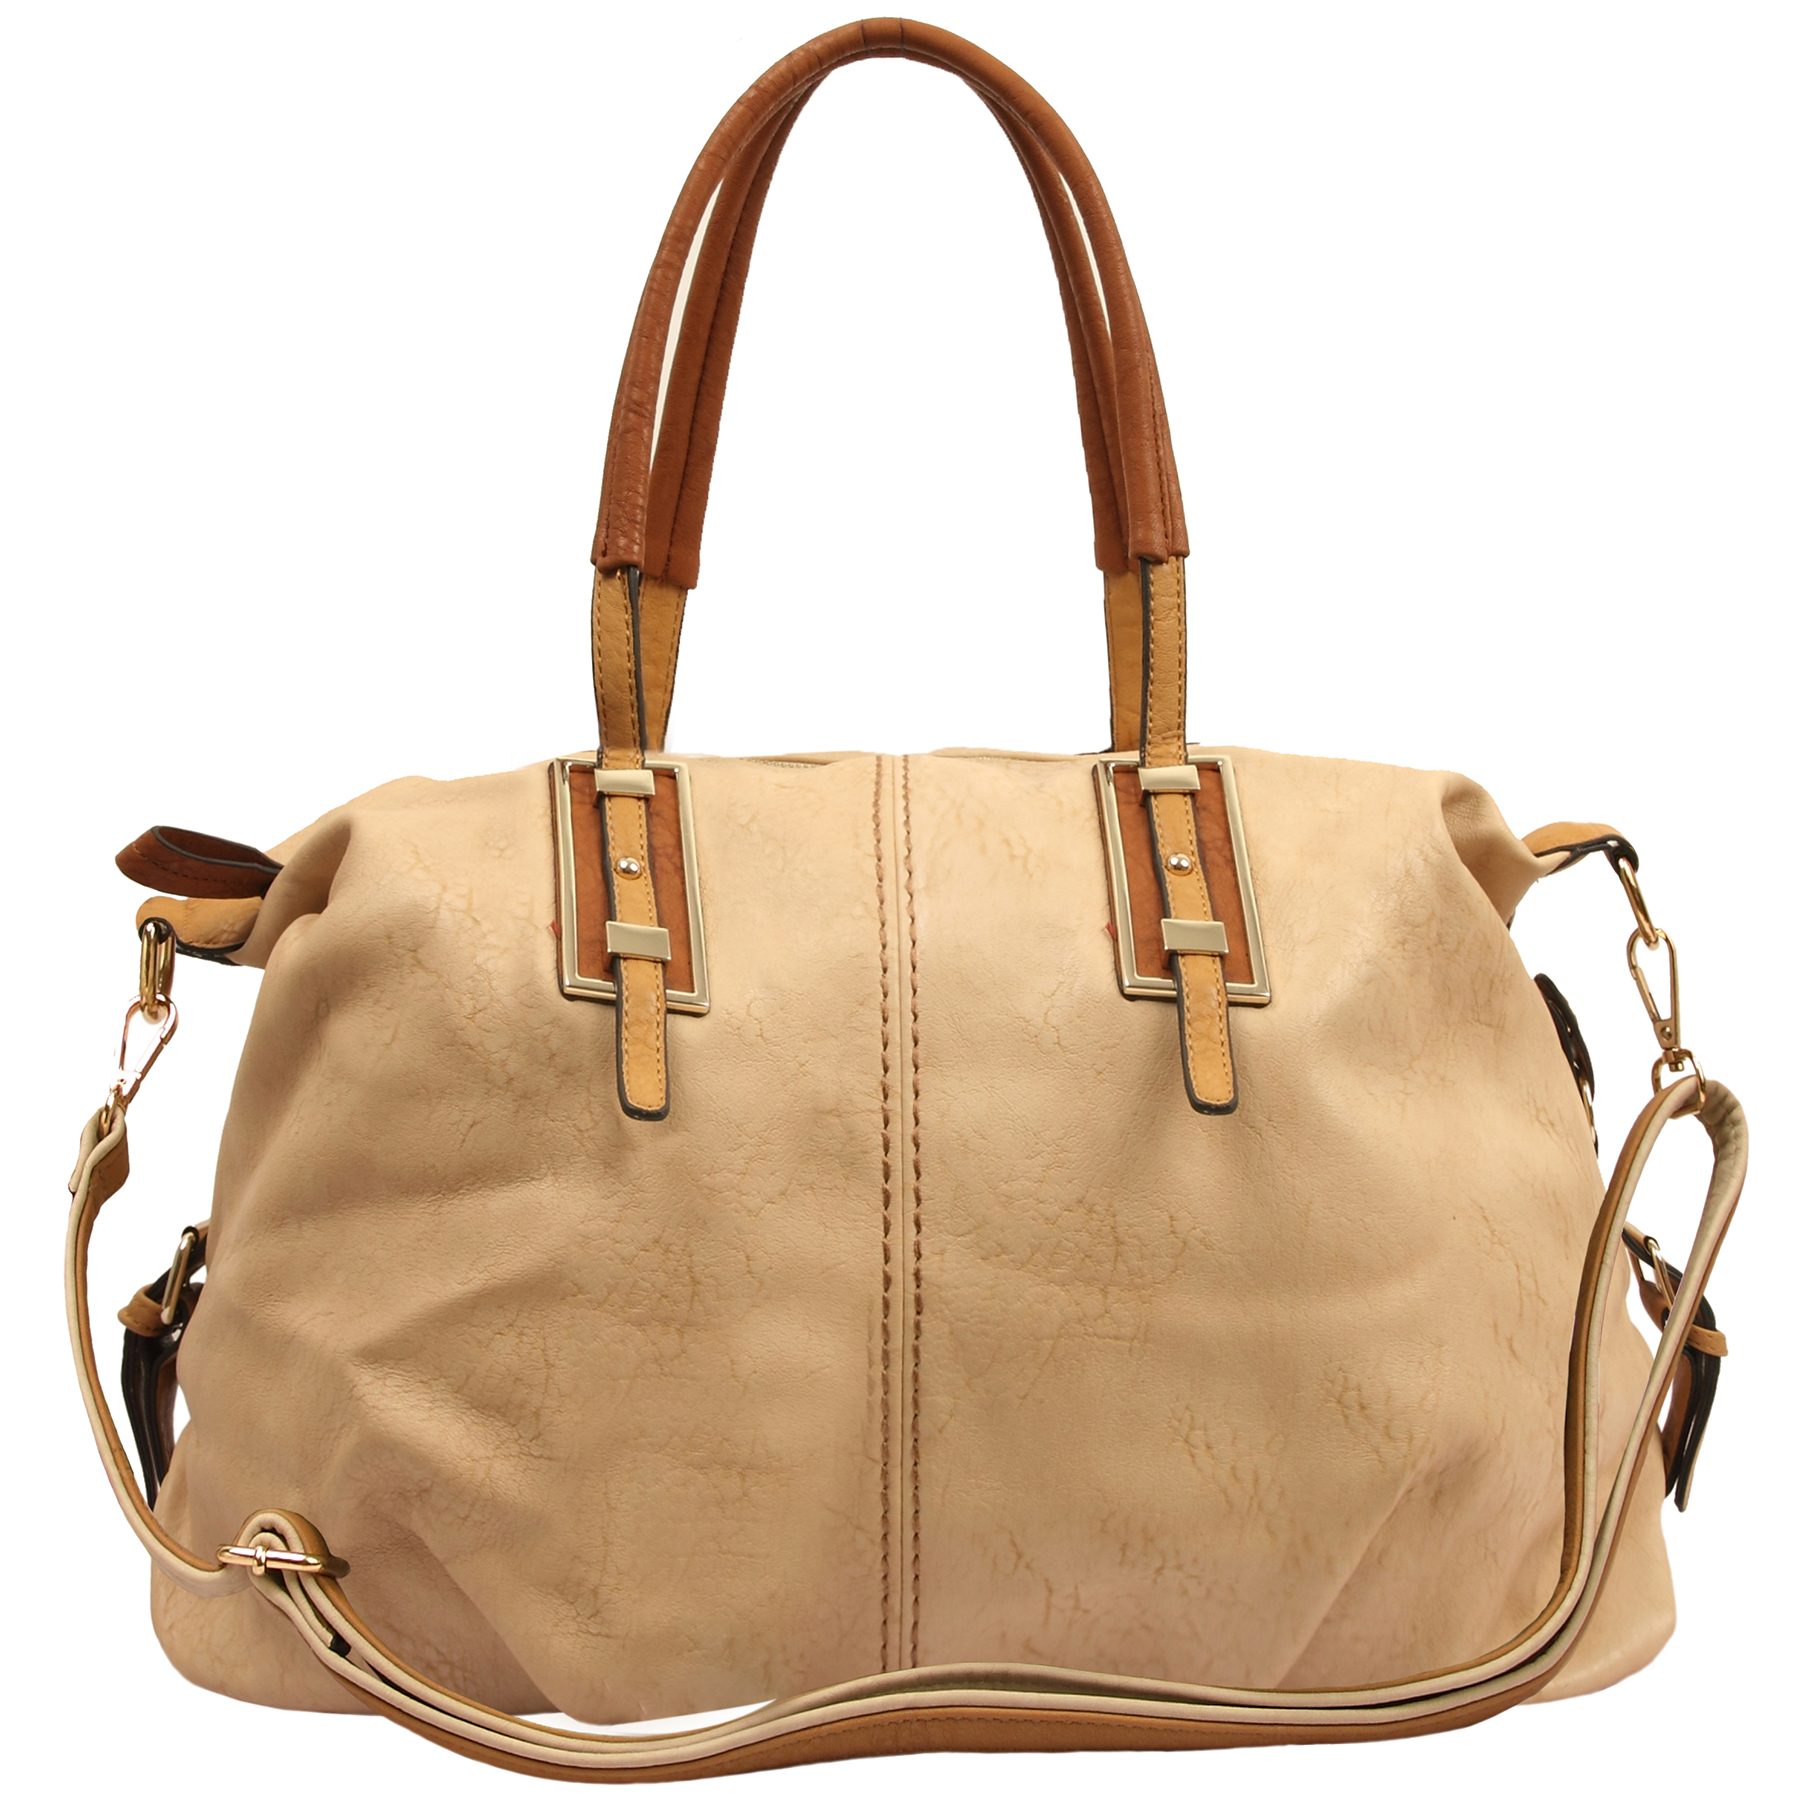 ACACIA Nude Large Everyday Shopper Hobo Handbag Front